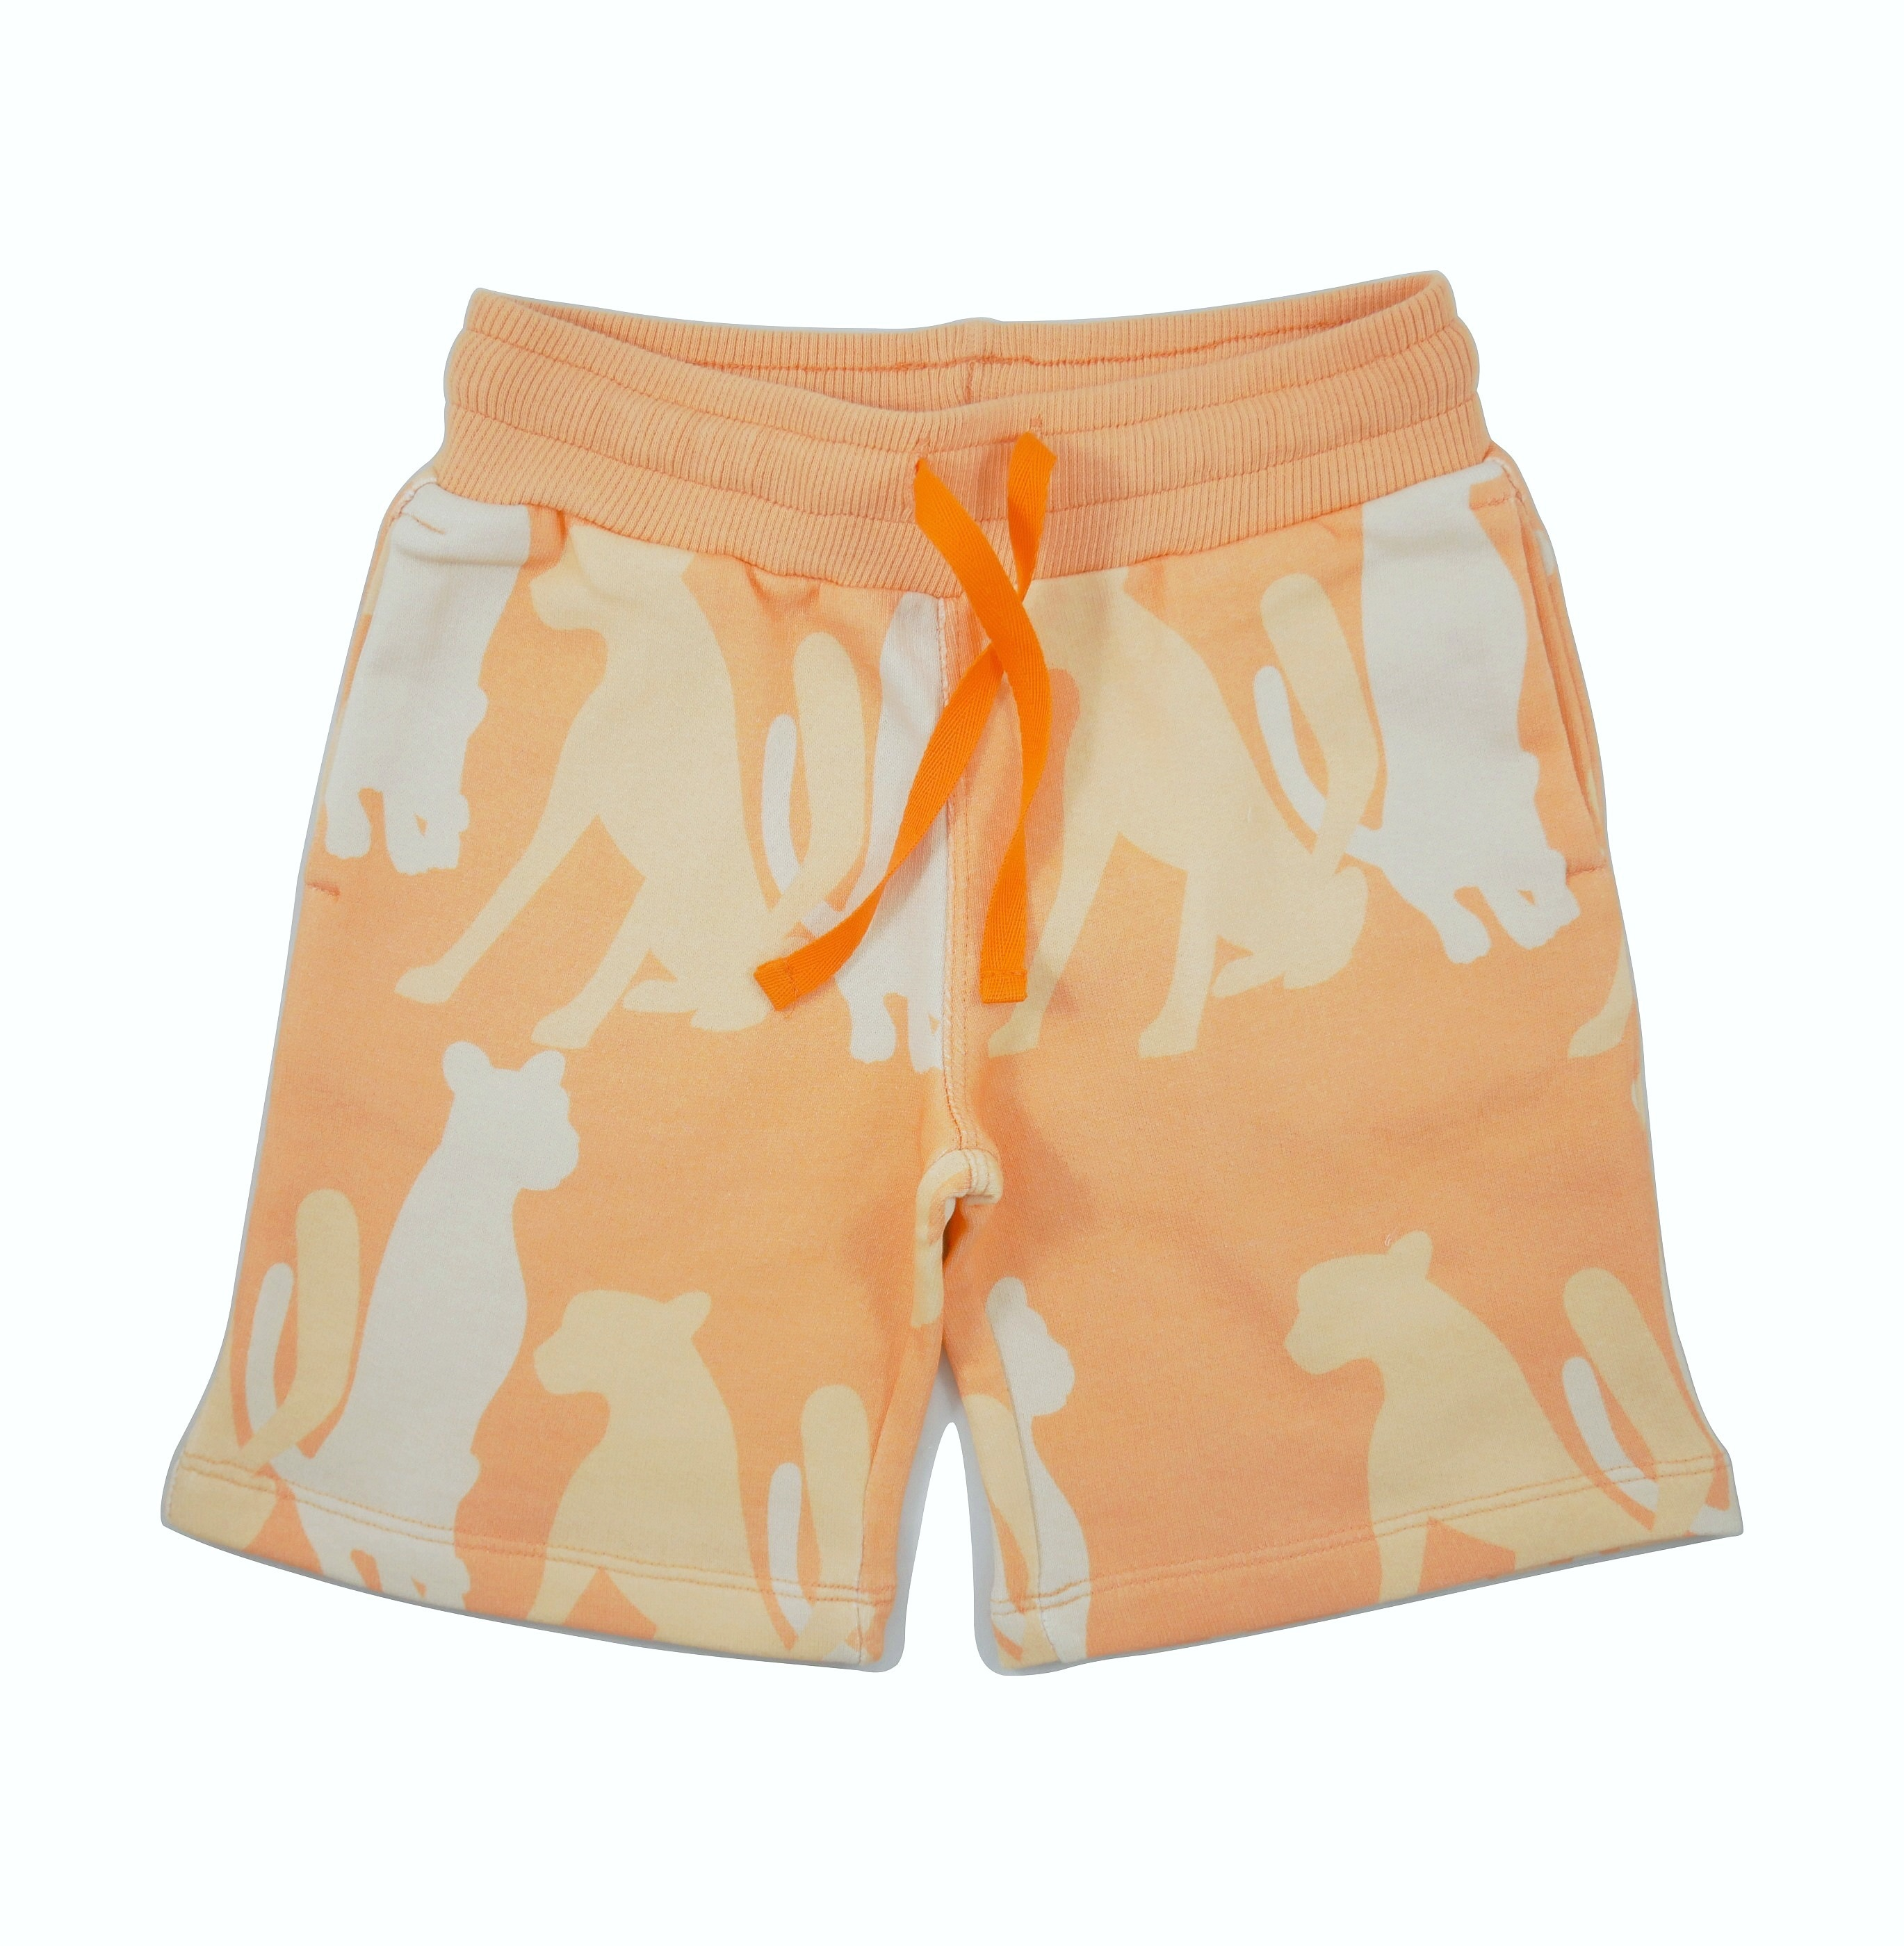 19SSSHC Shorts Cheetah Silouette